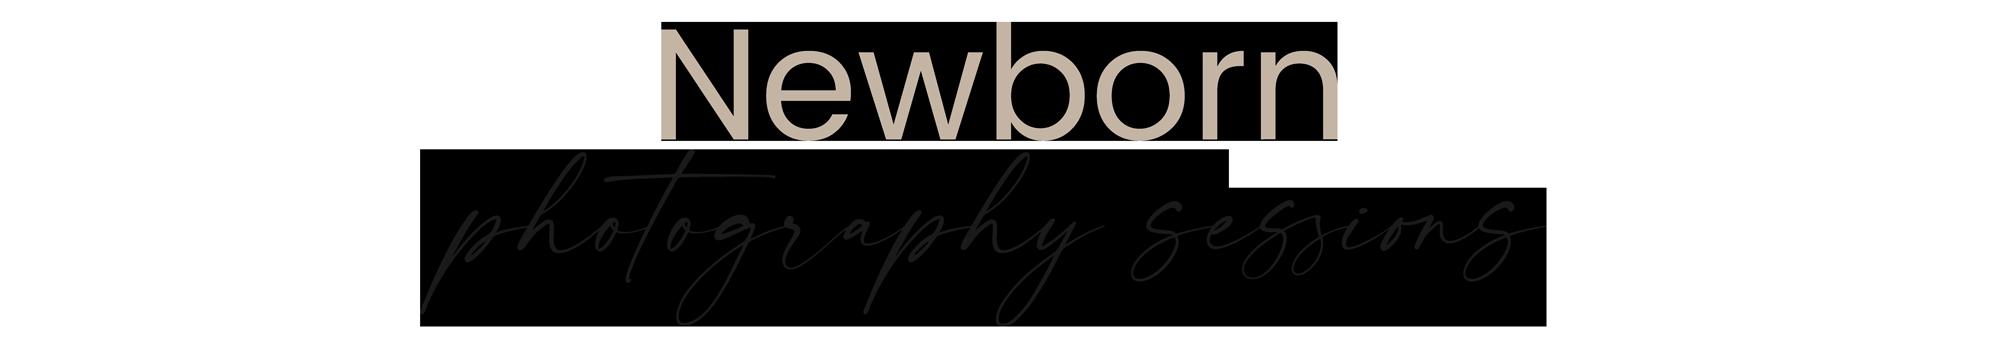 best-newborn-photography-sydney-lifestyle-baby-photographer